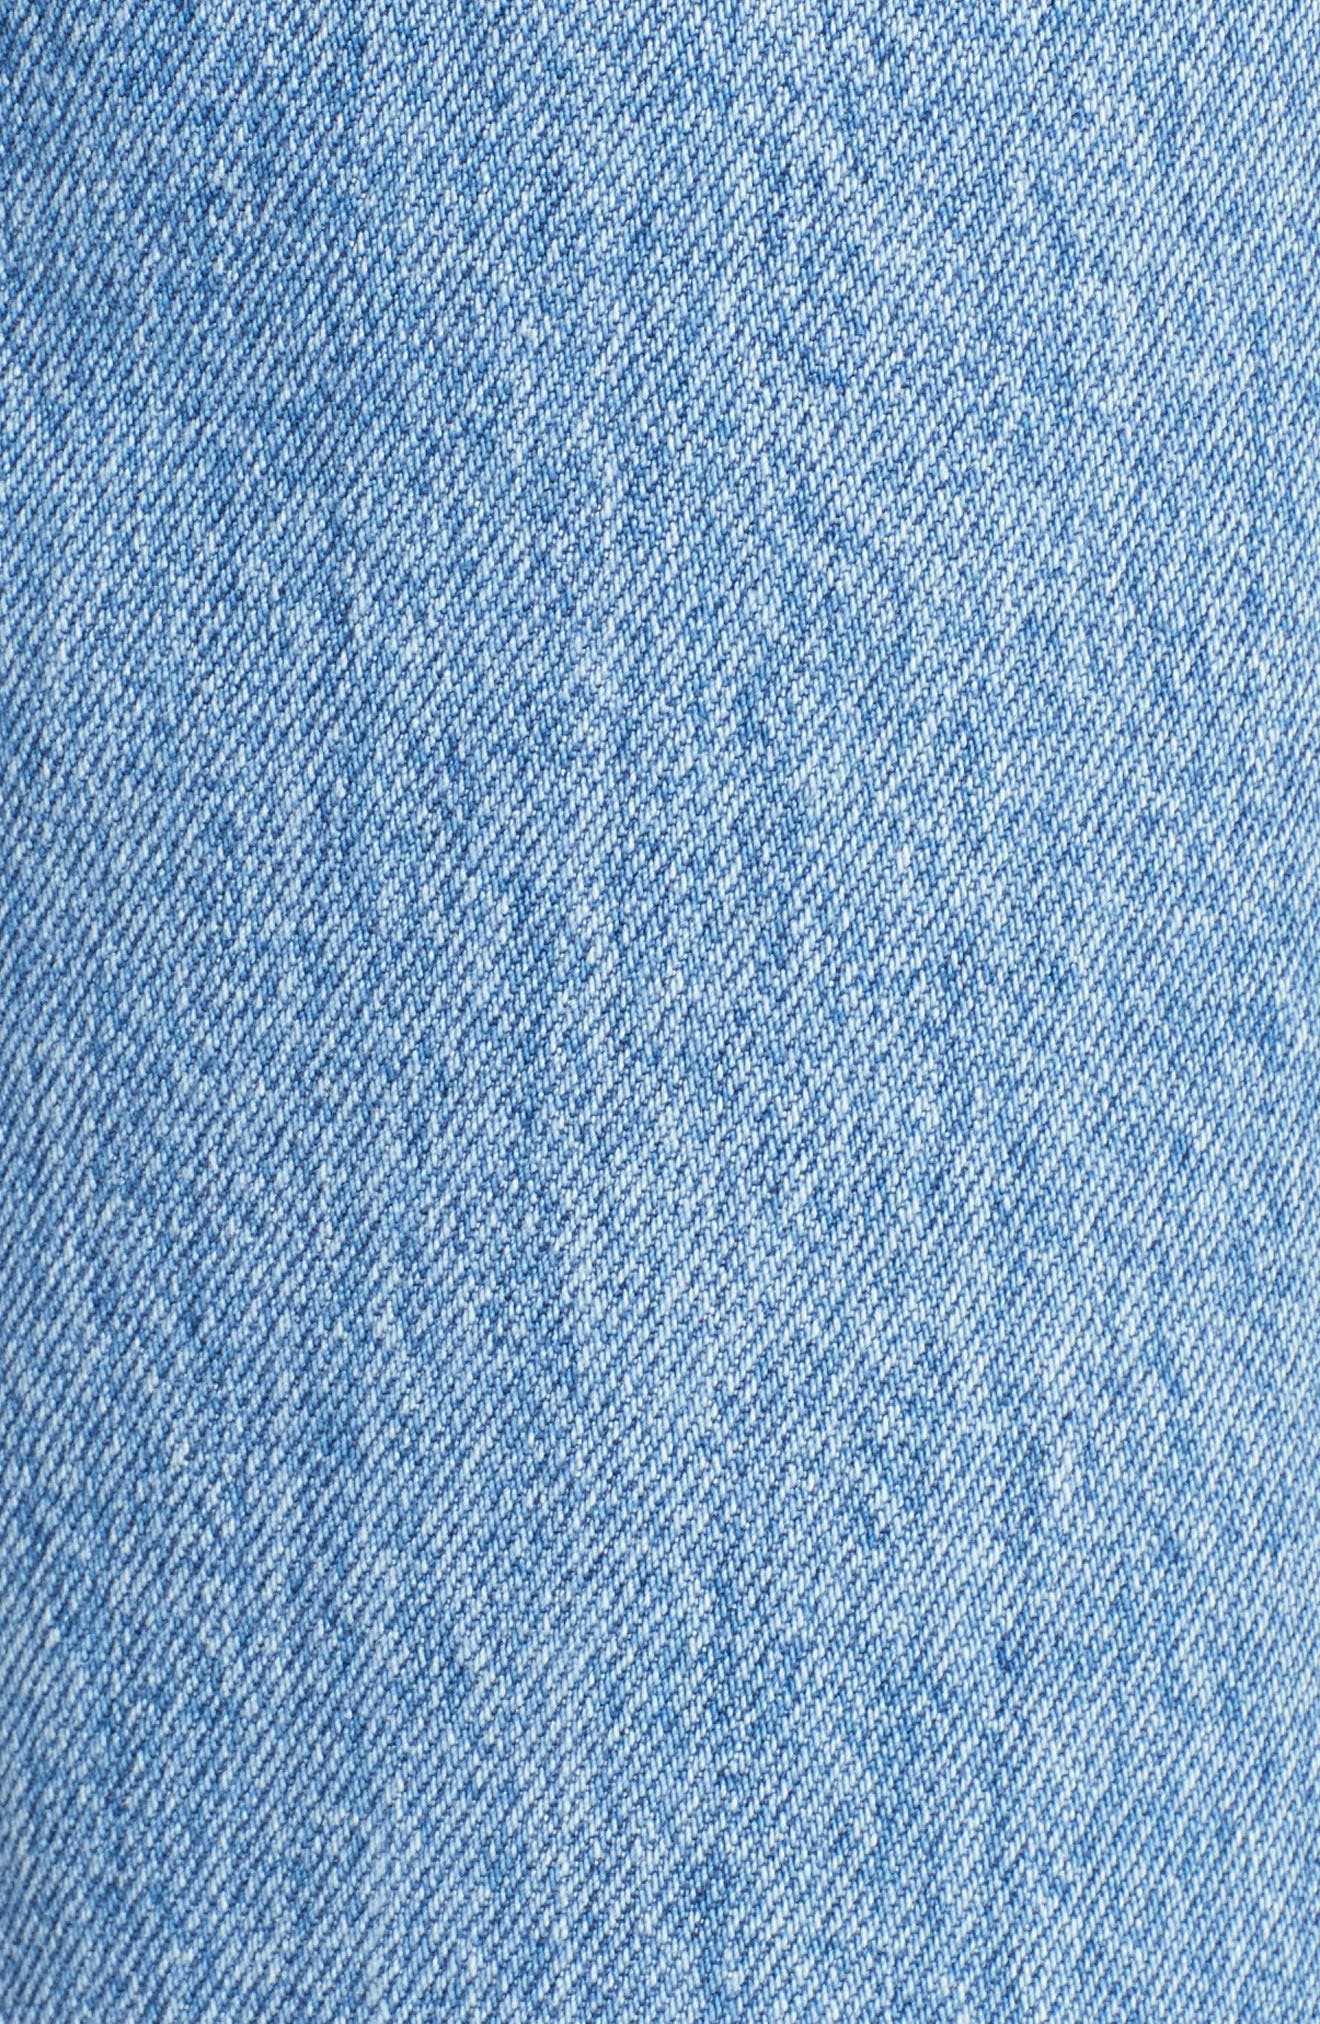 High Waist Crop Flare Jeans,                             Alternate thumbnail 6, color,                             491